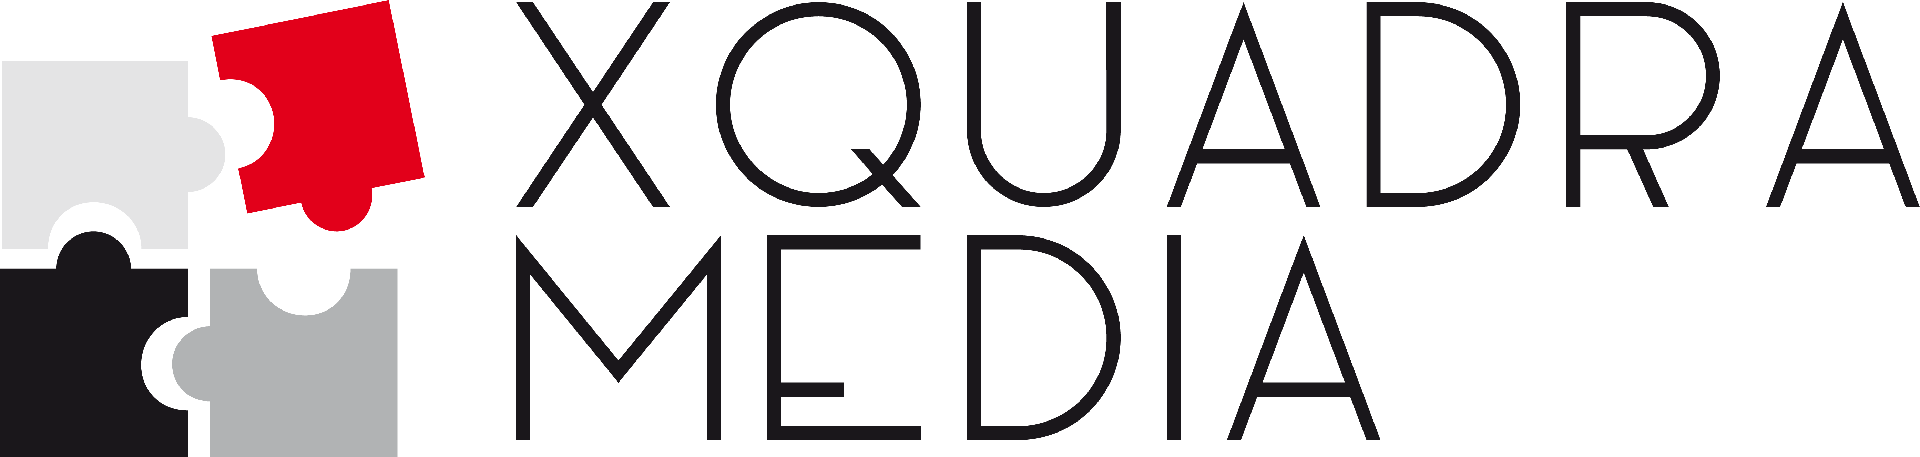 XQuadra Media